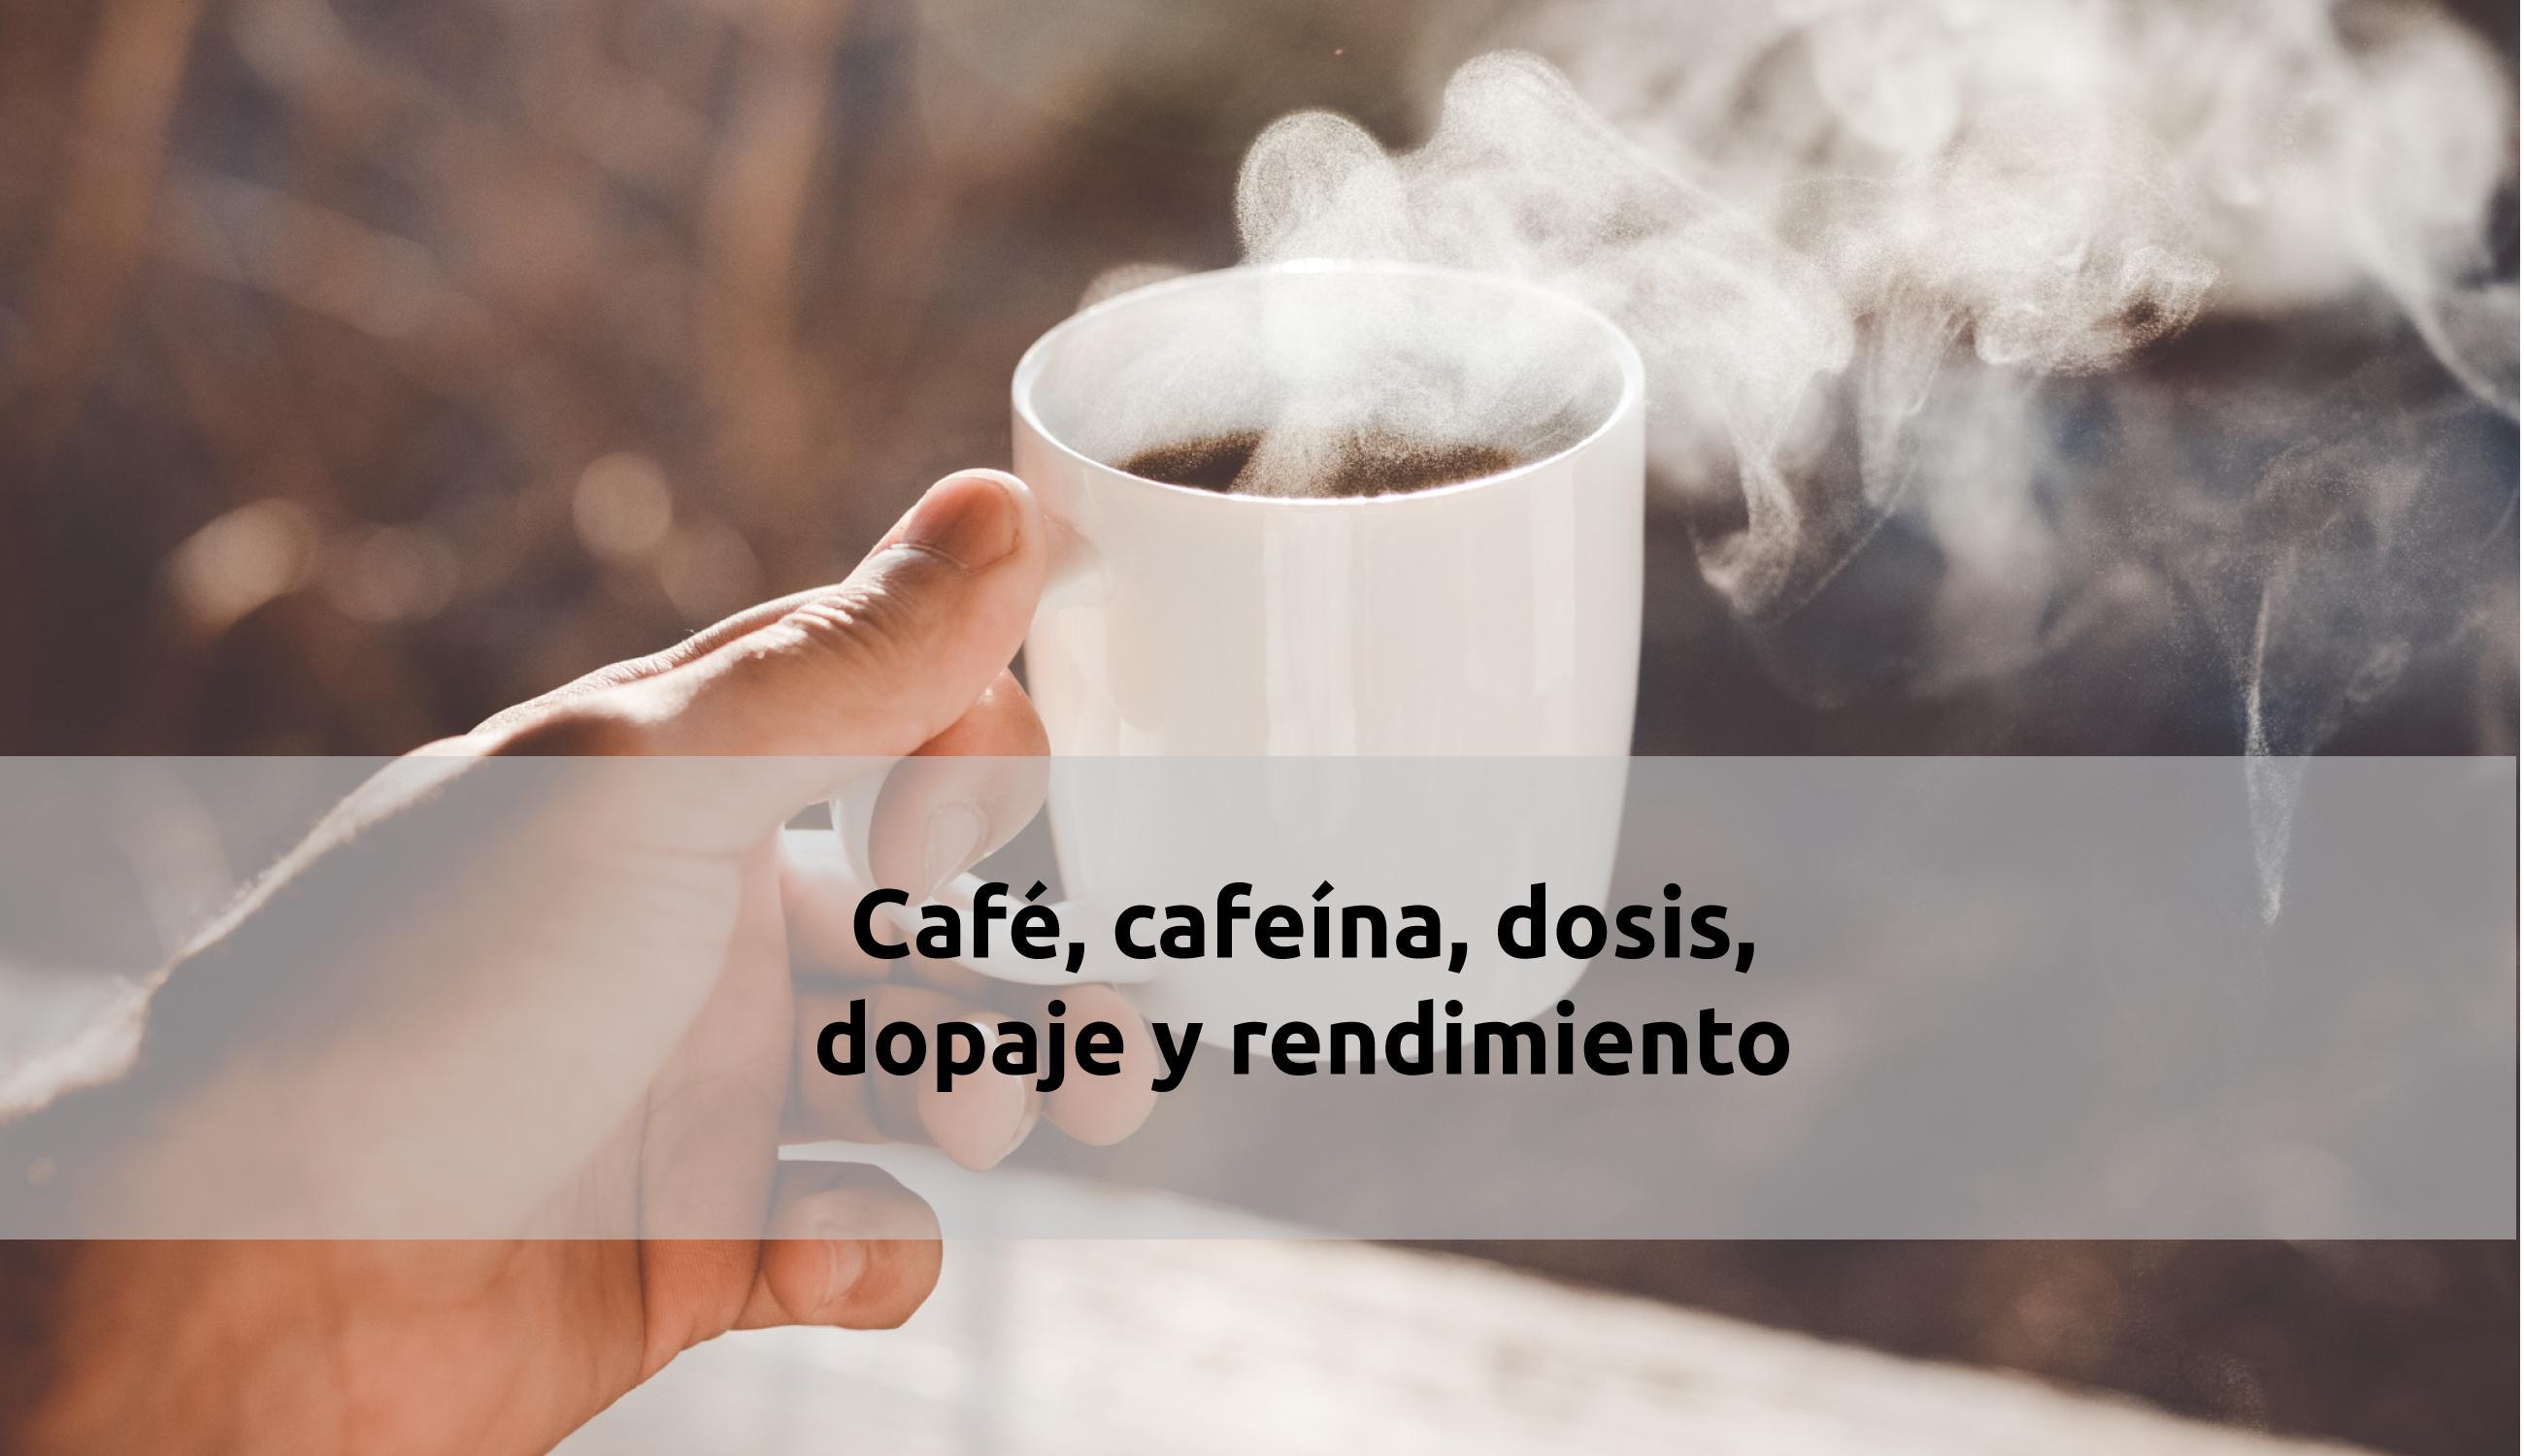 cafe-cafeina-rendimiento